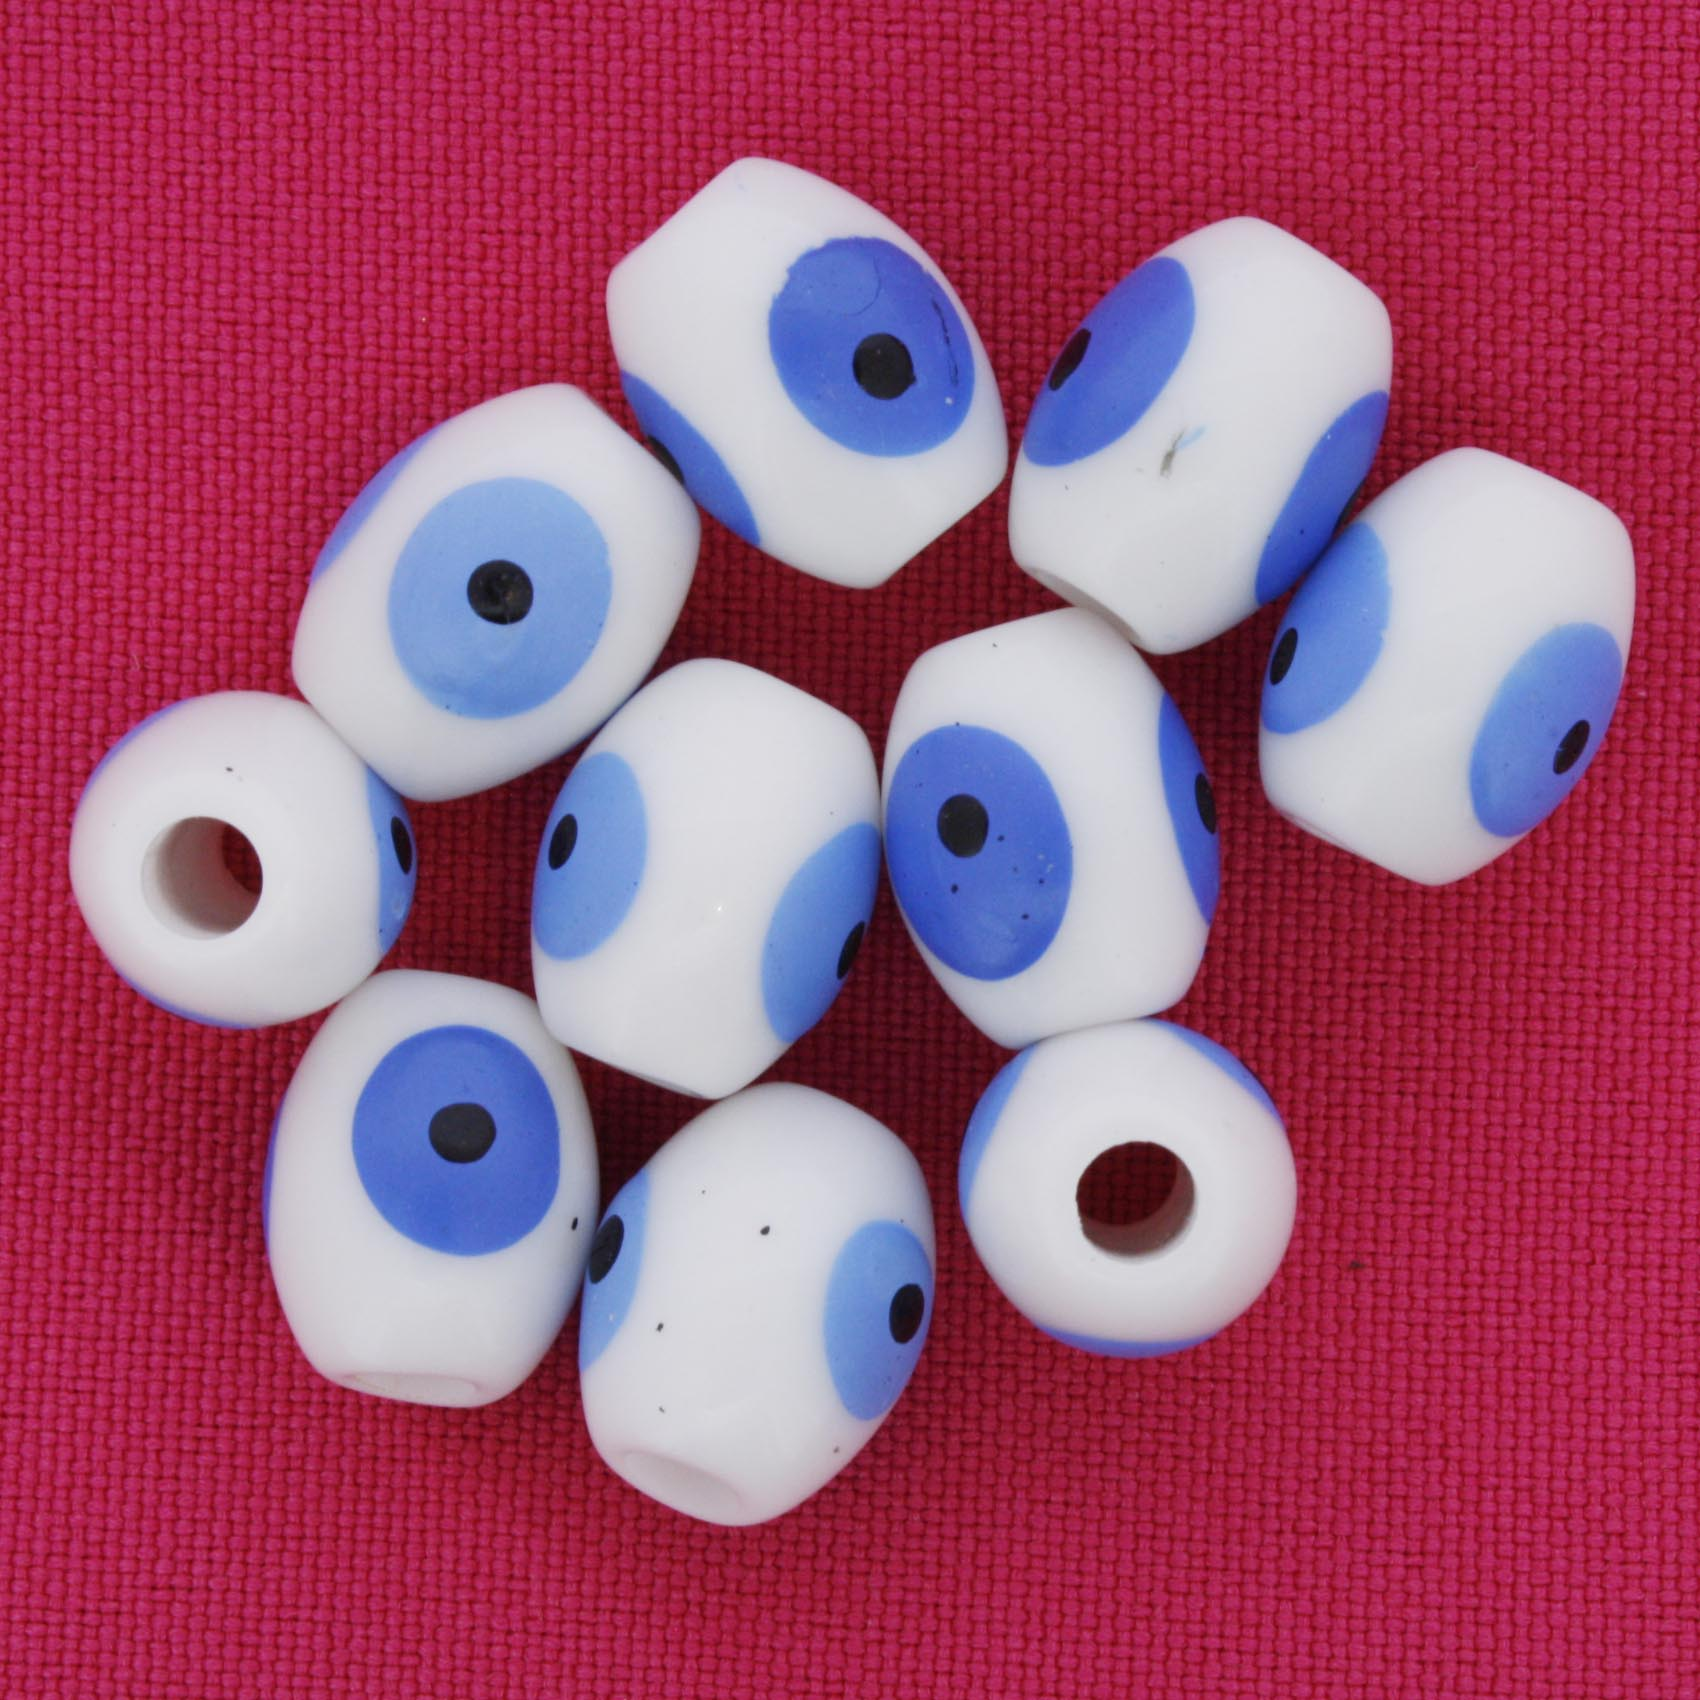 Olho Grego - Oval - Branco - 13x10mm  - Stéphanie Bijoux® - Peças para Bijuterias e Artesanato